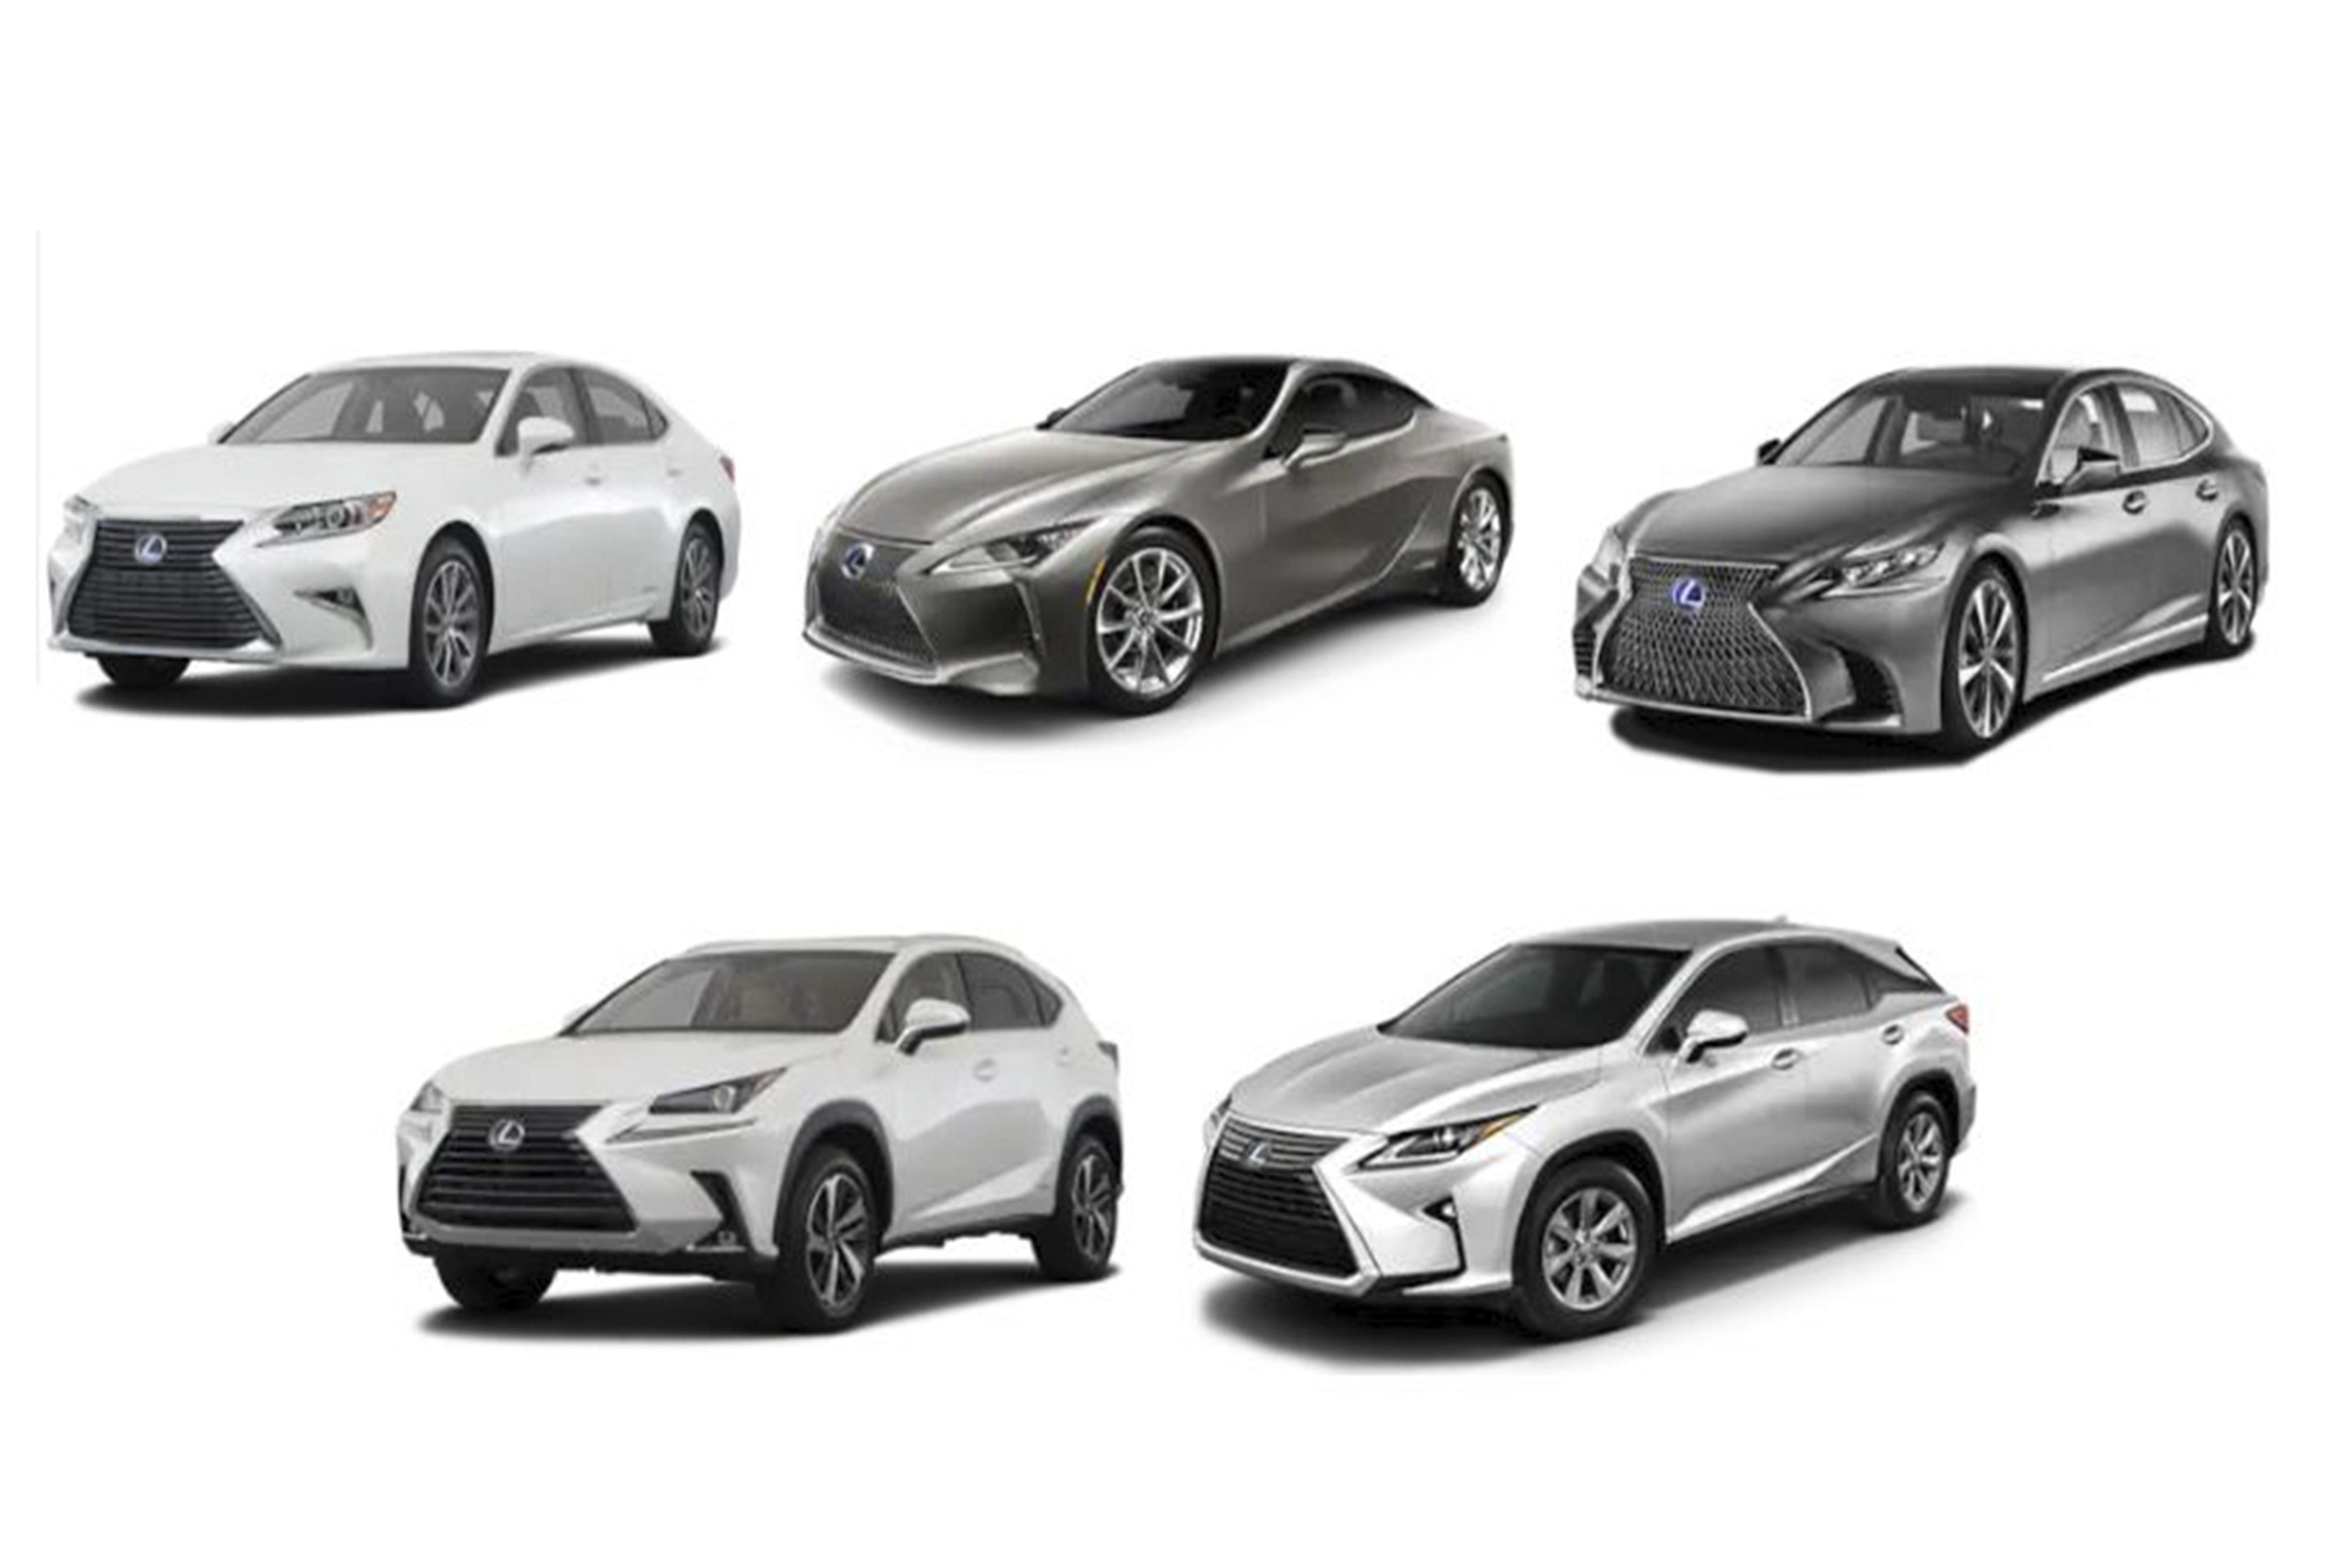 2019 Lexus Model Showroom Explore Lexus Vehicles With Images